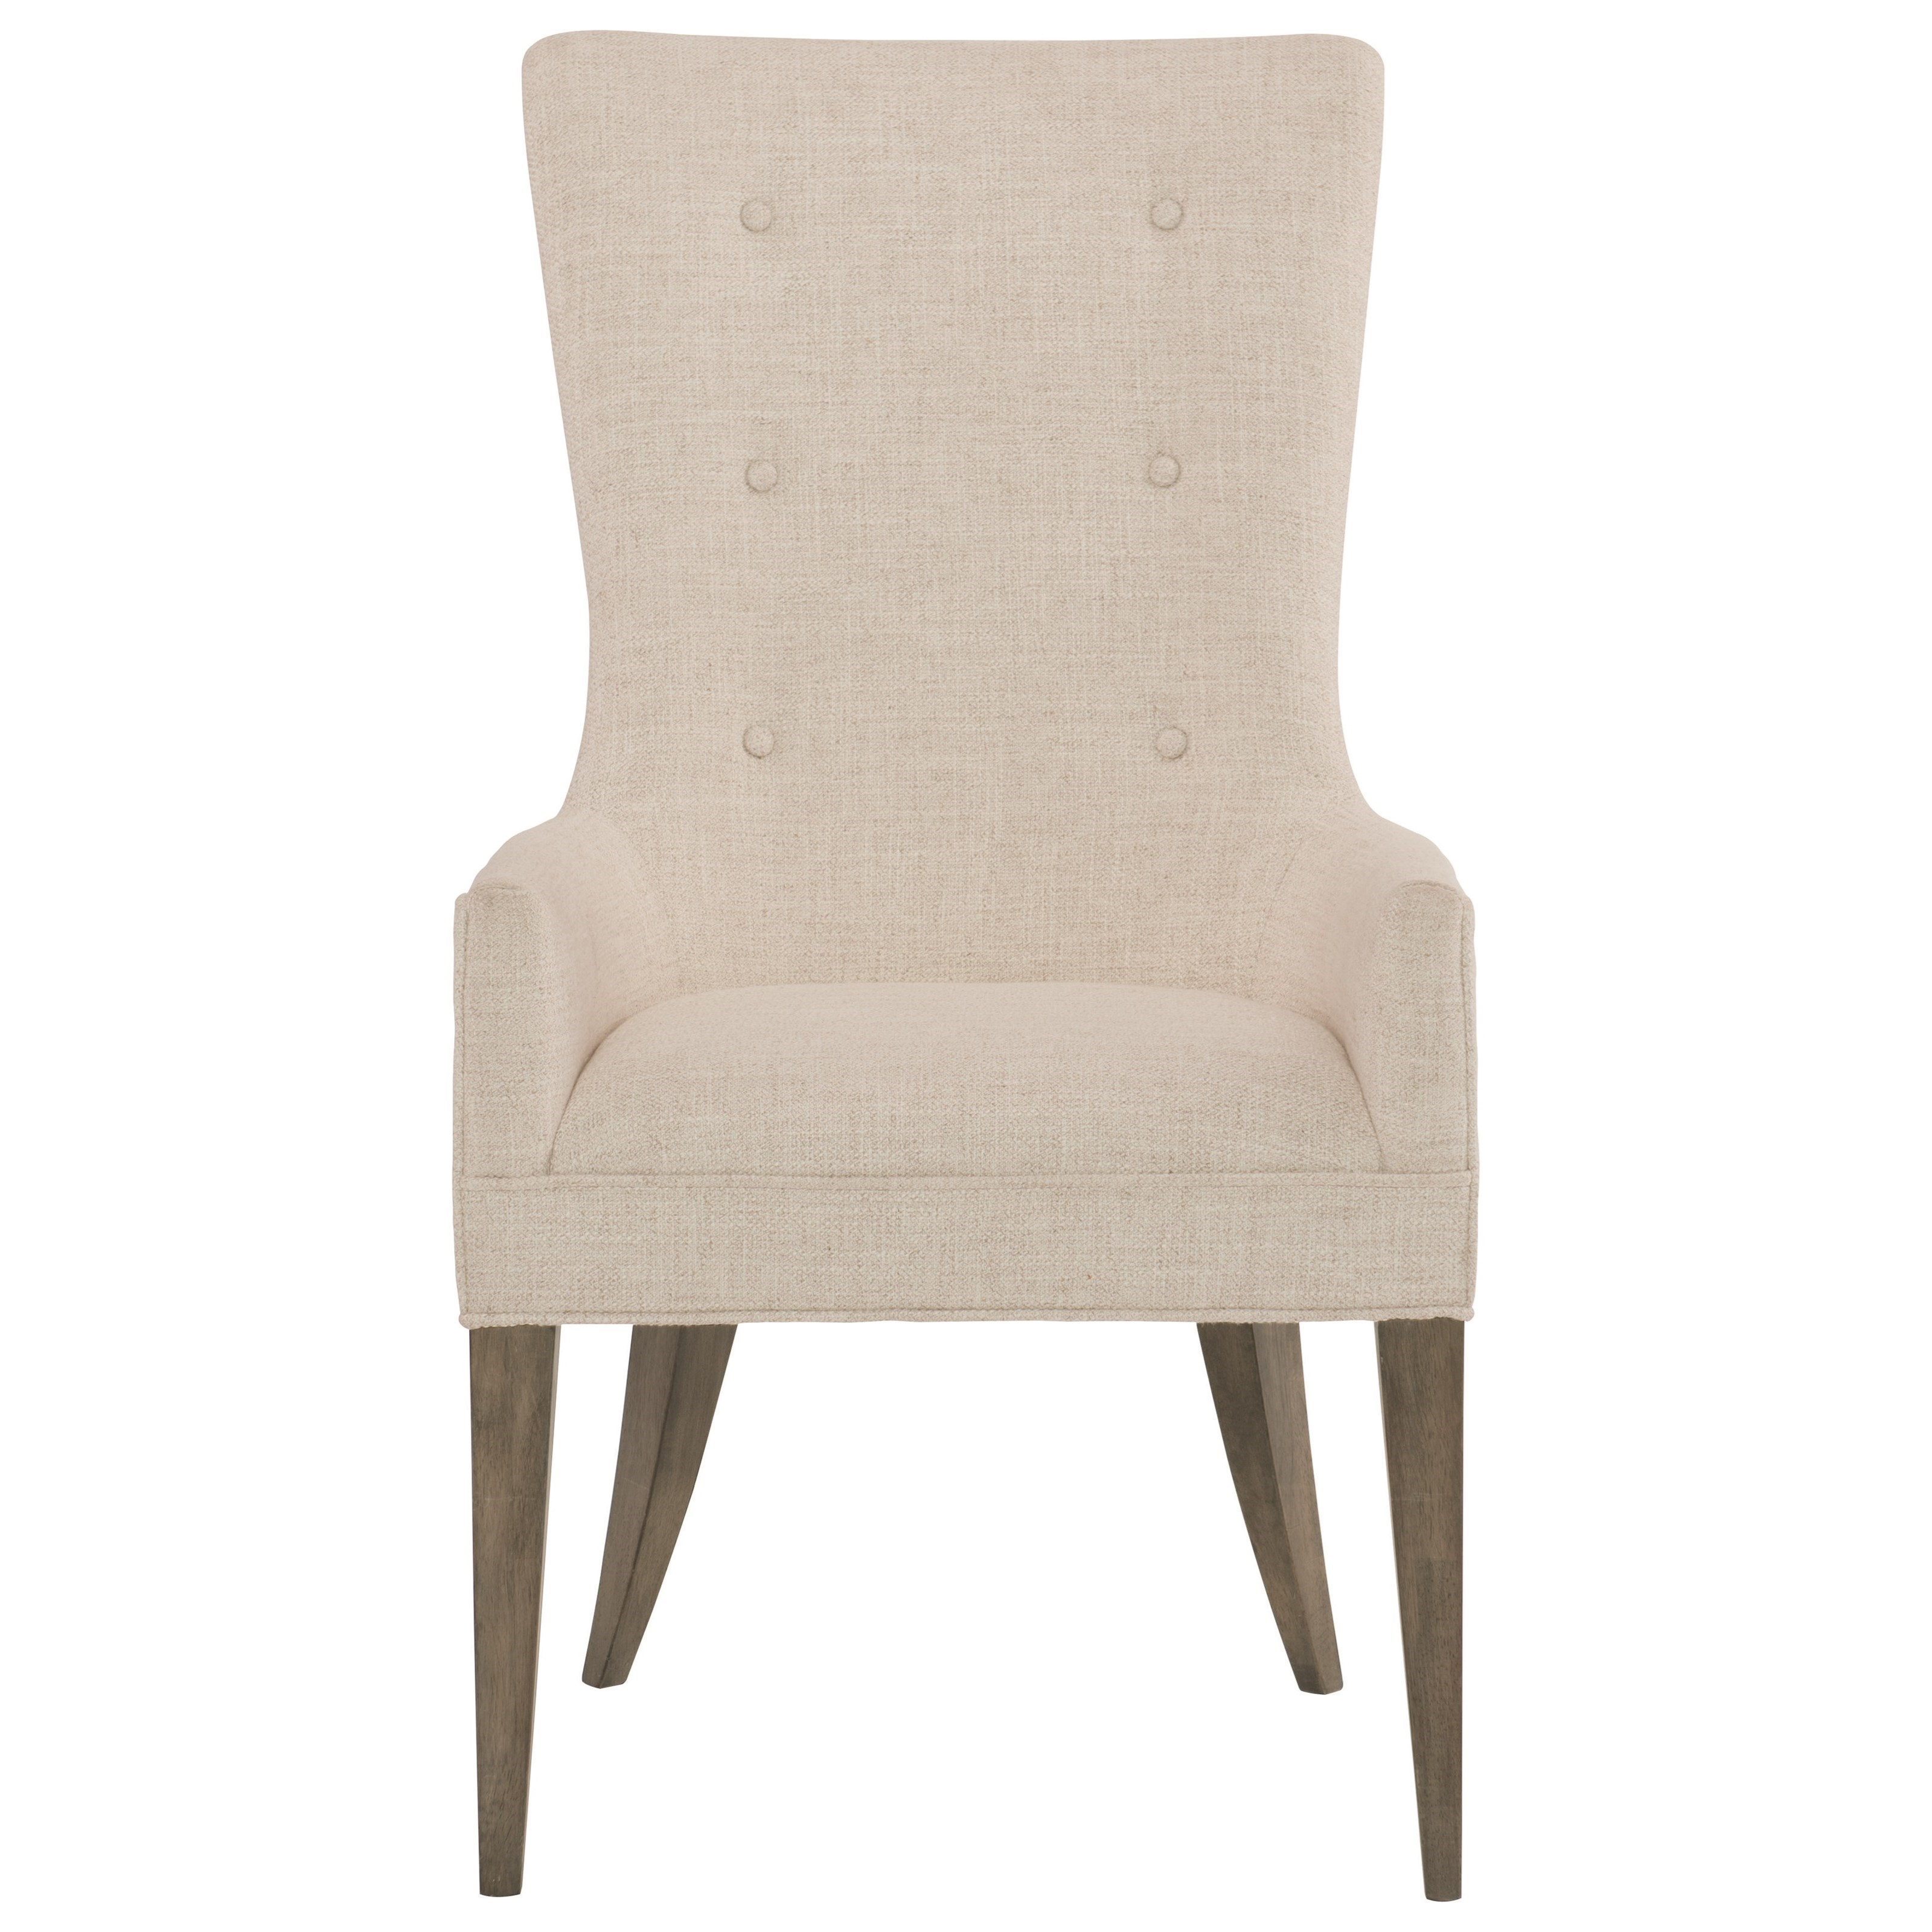 Bernhardt Profile Upholstered Arm Chair - Item Number: 378-548